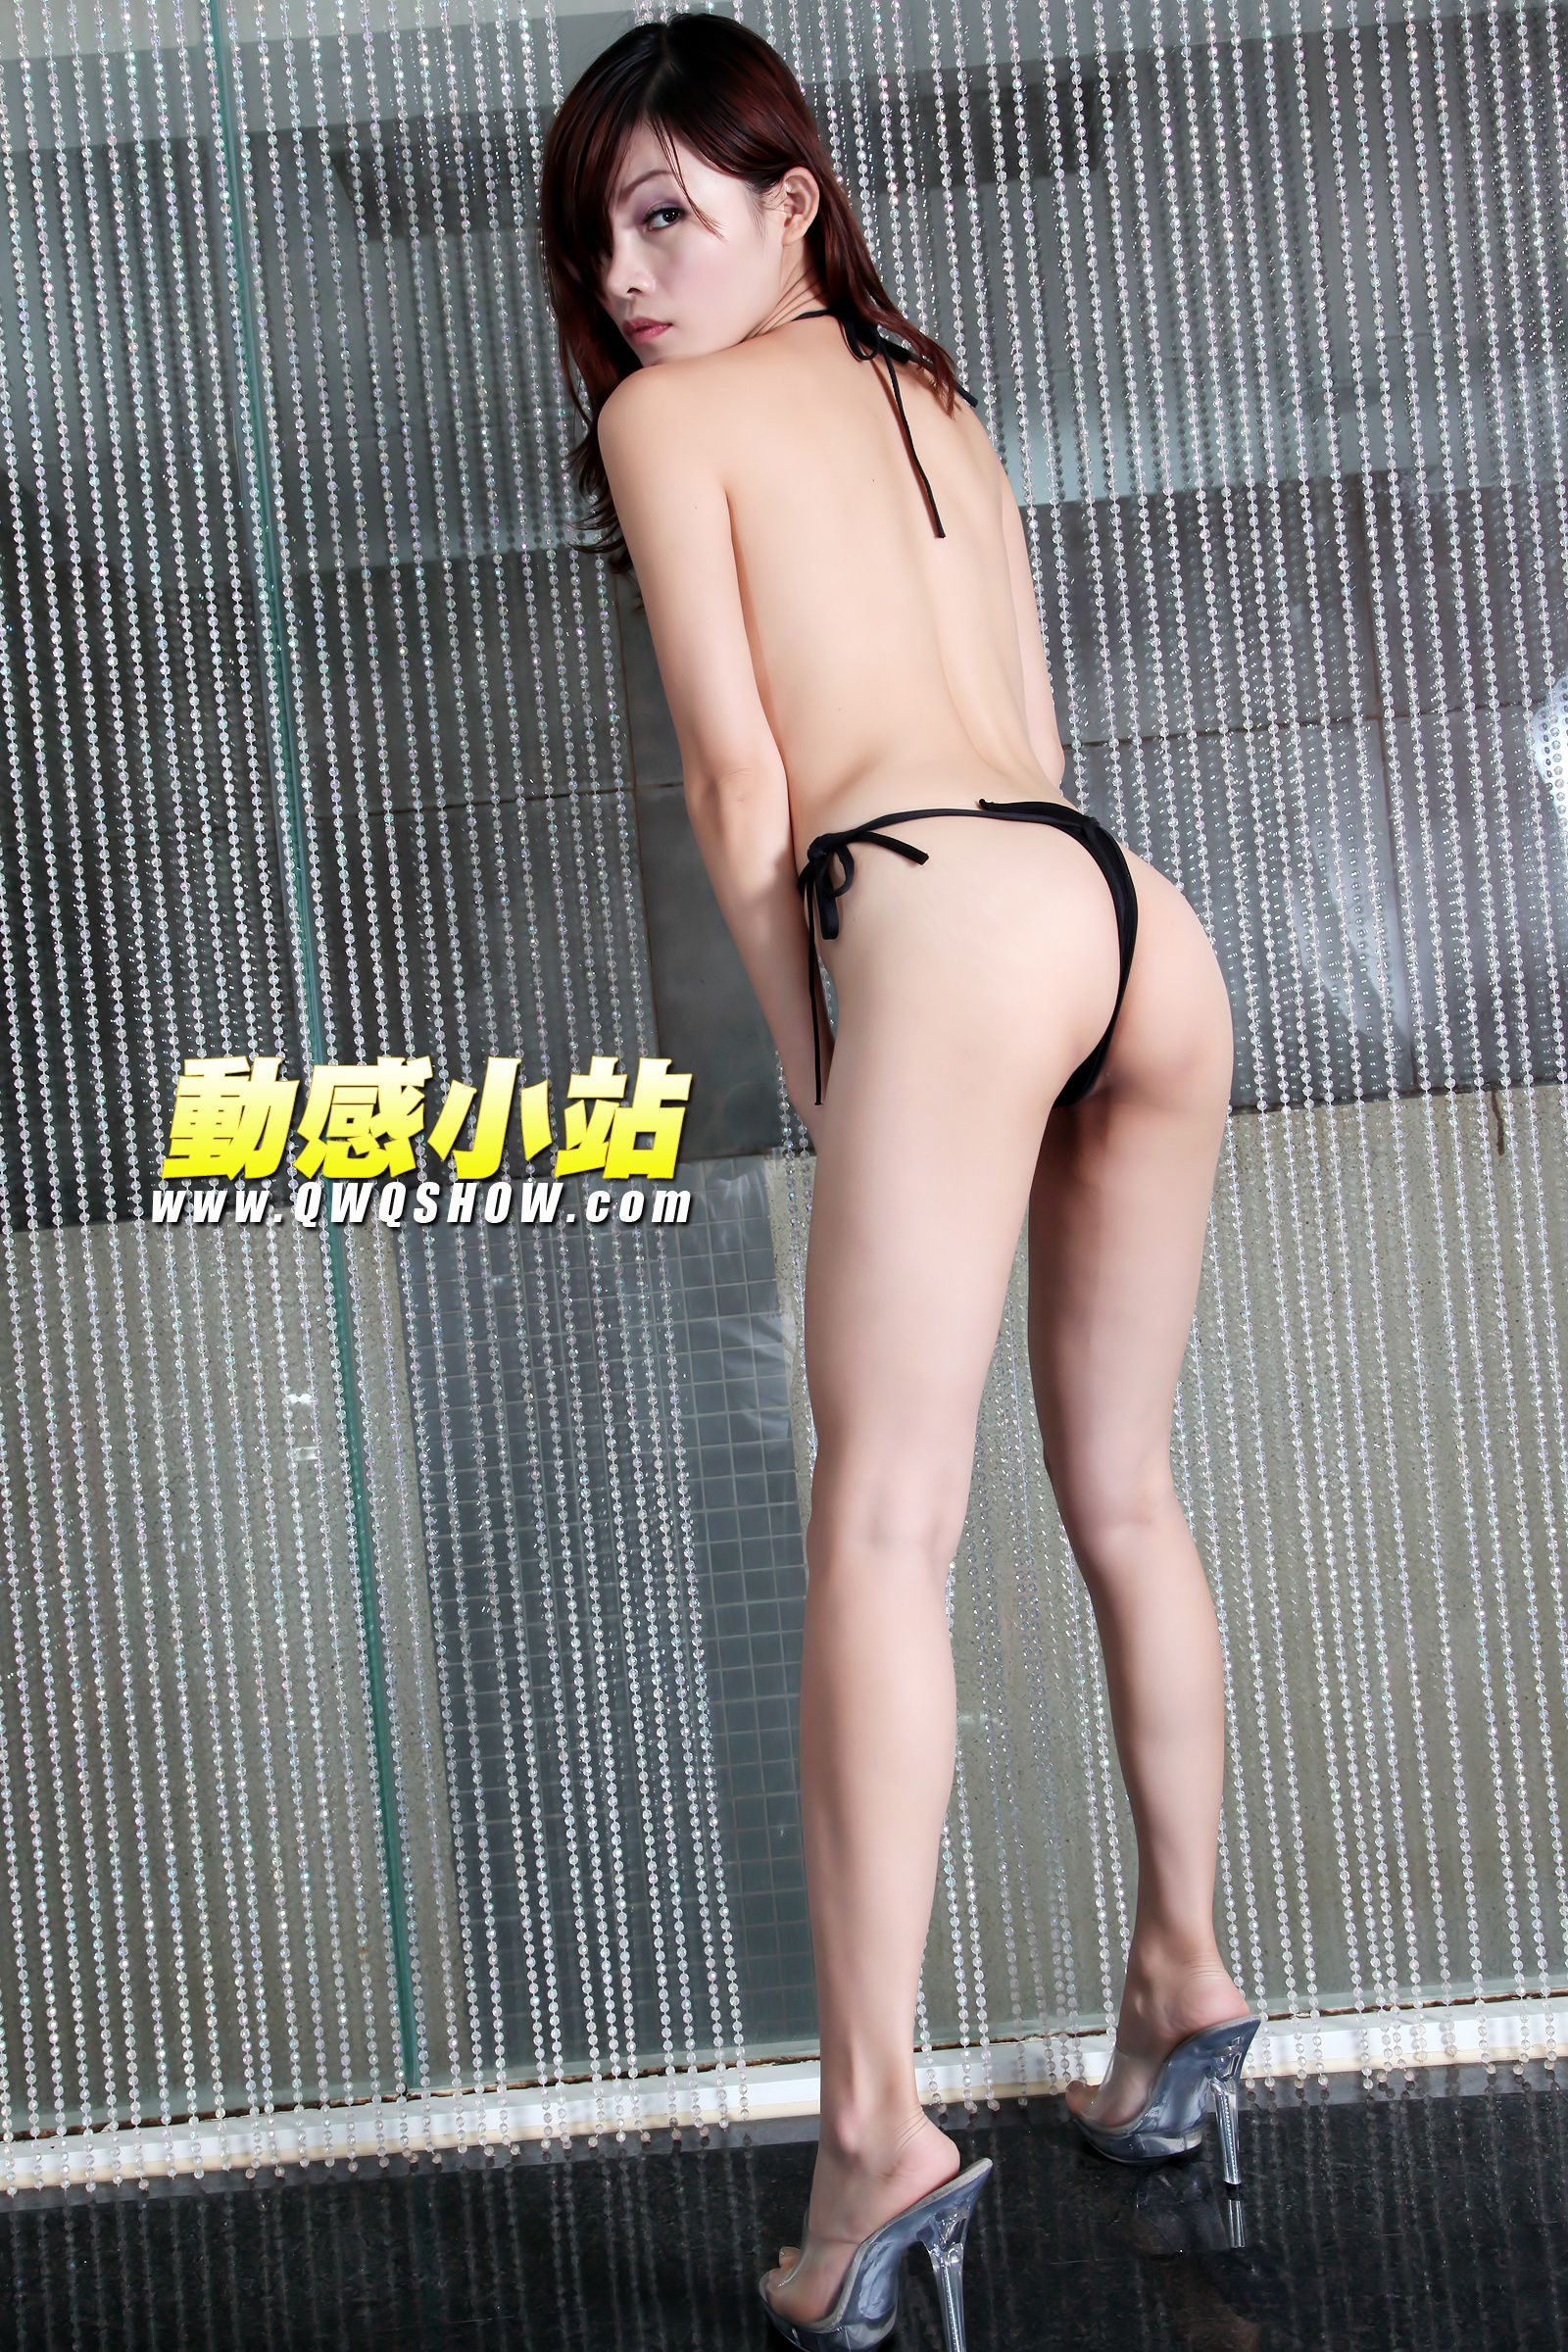 VOL.1361 [动感之星]高叉泳装:小蝶(动感小站小蝶,动感之星小蝶)高品质写真套图(75P)